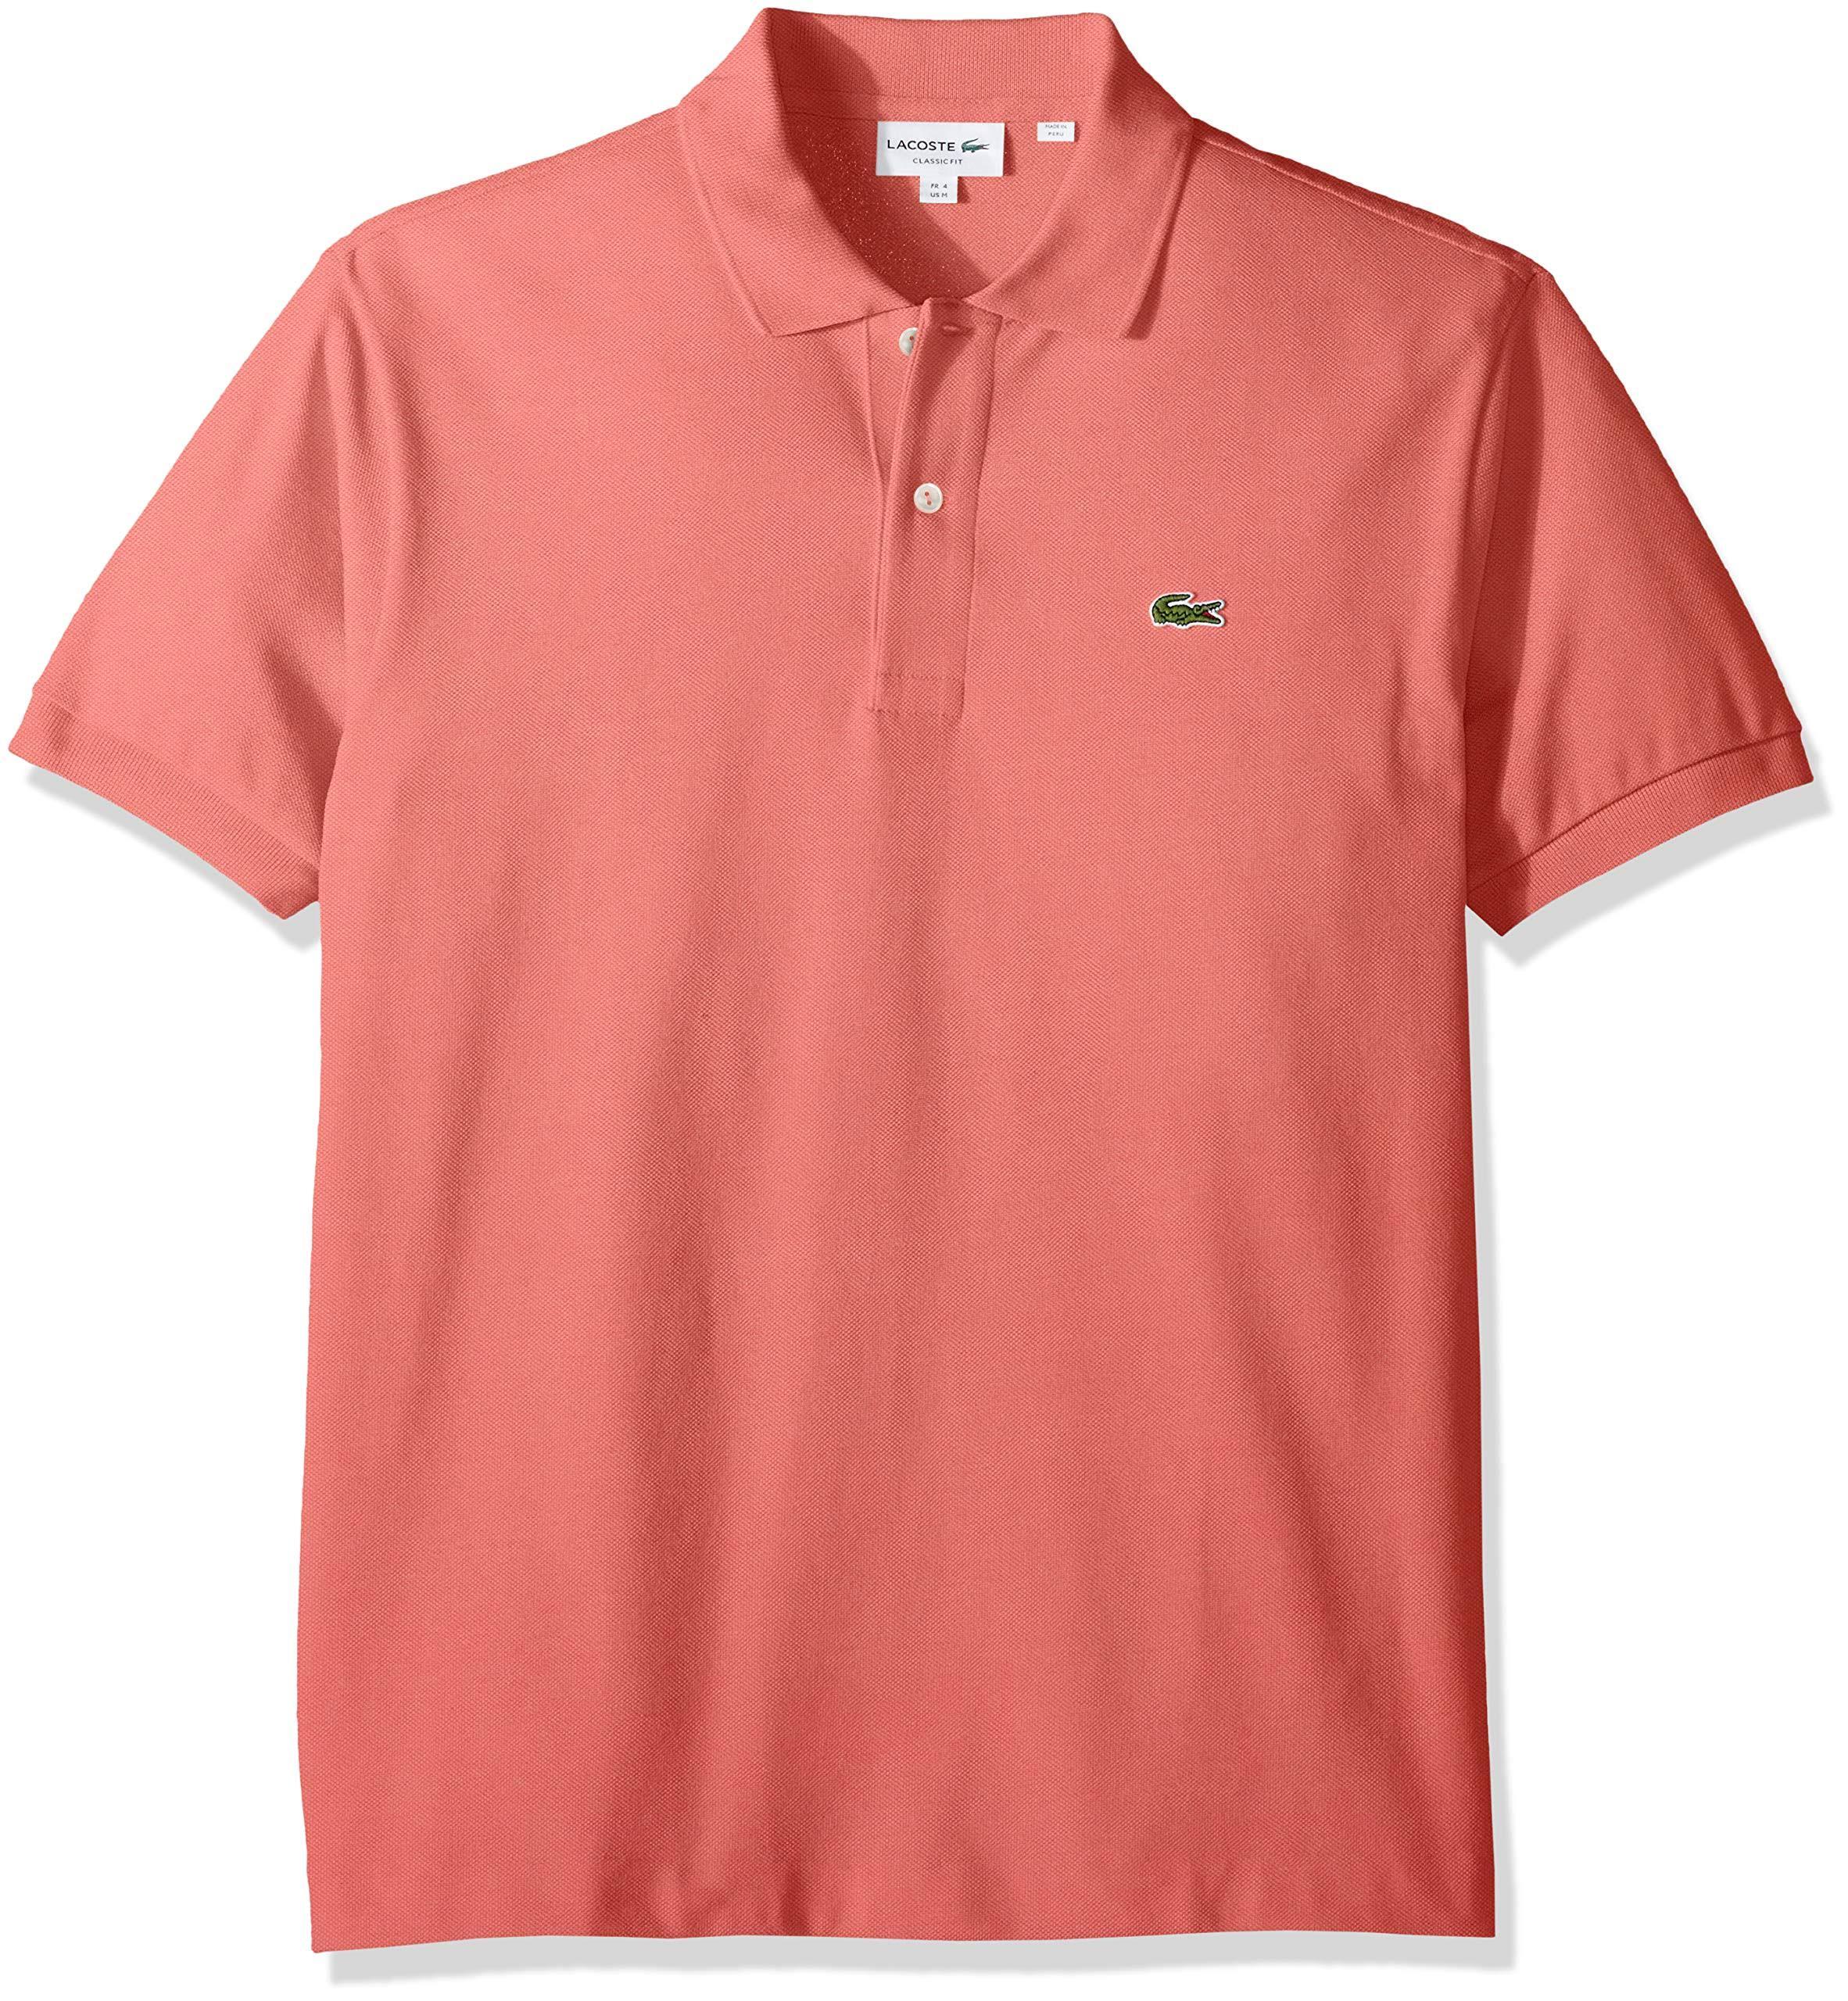 Herren Klassisches Kurzarm Lacoste Pique L 12 12 Poloshirt v6wn8qd47